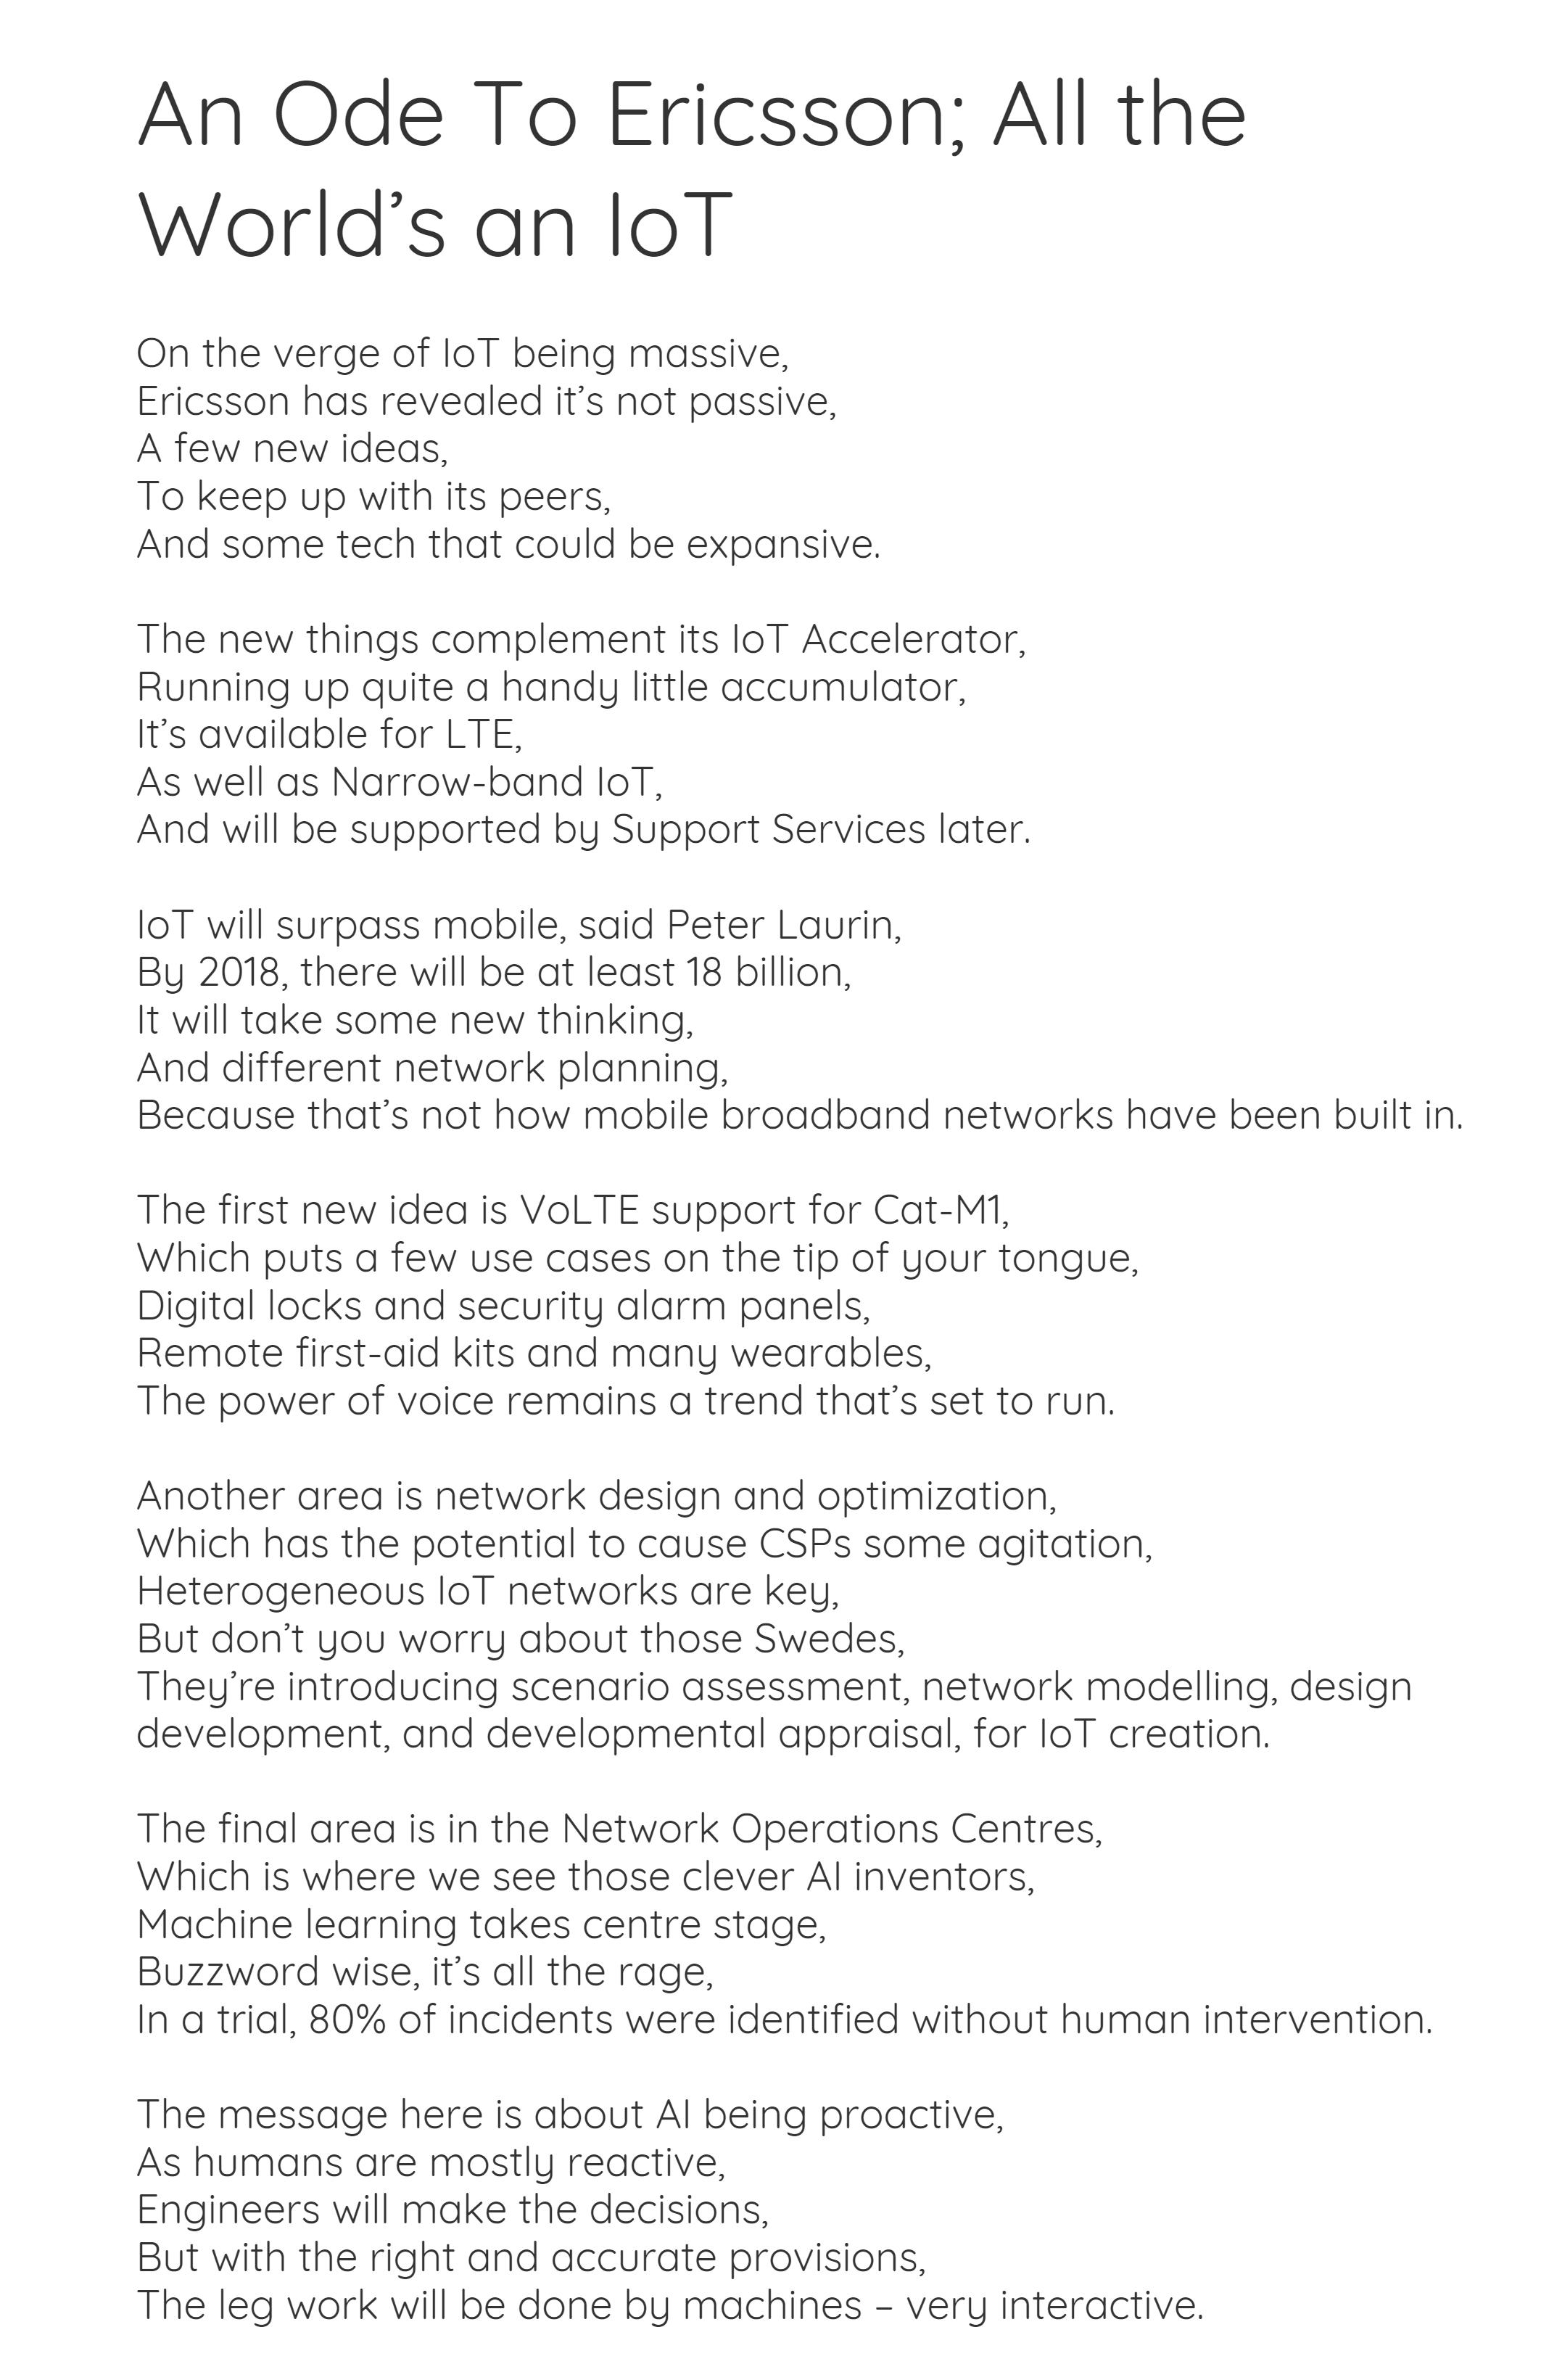 Ericsson poem 3